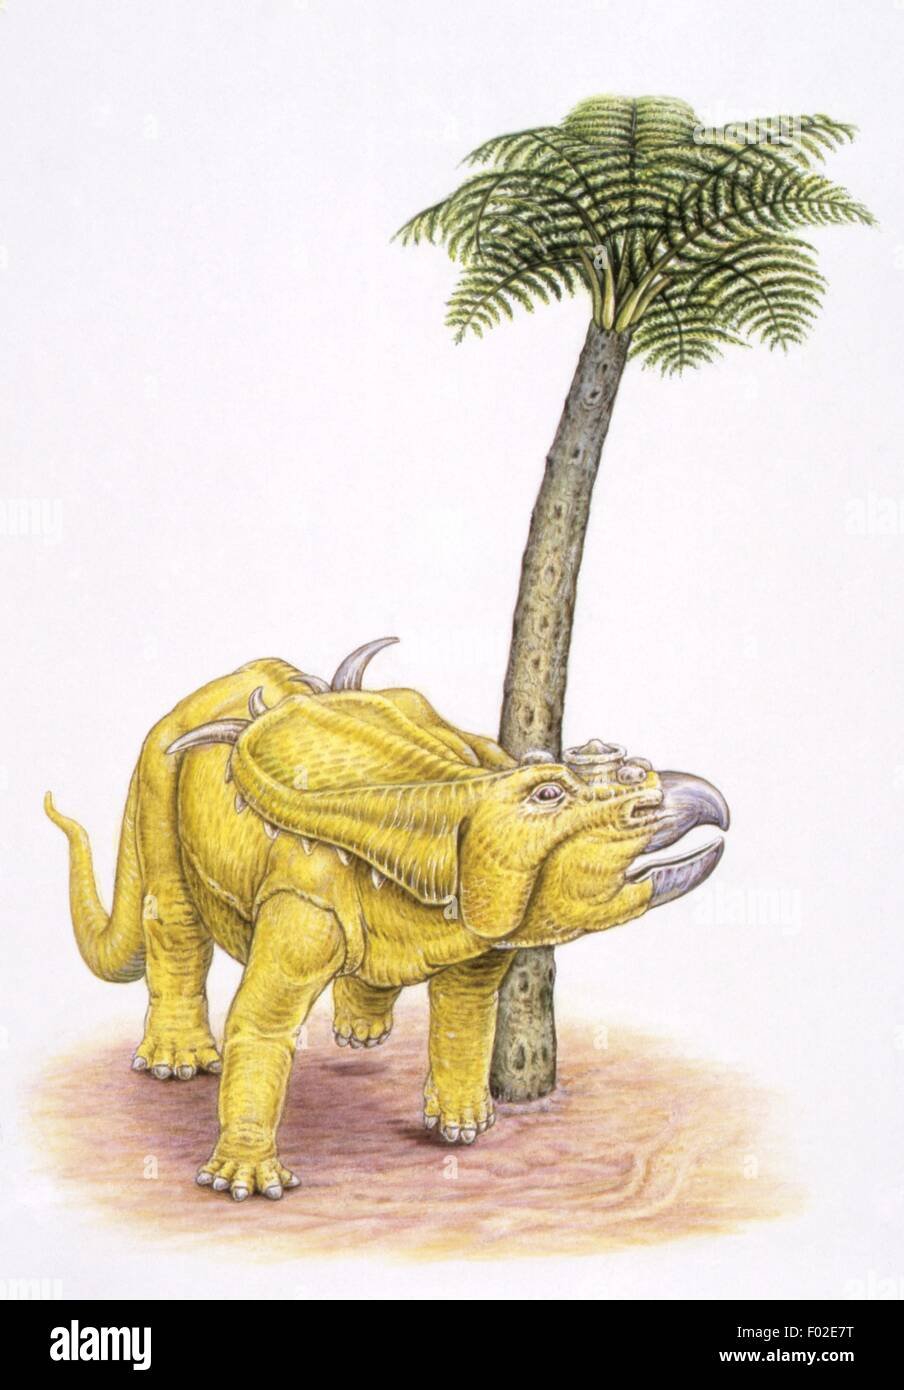 Palaeozoology - Kreidezeit - Dinosaurier - Pachyrhinosaurus - Kunstwerk Stockfoto